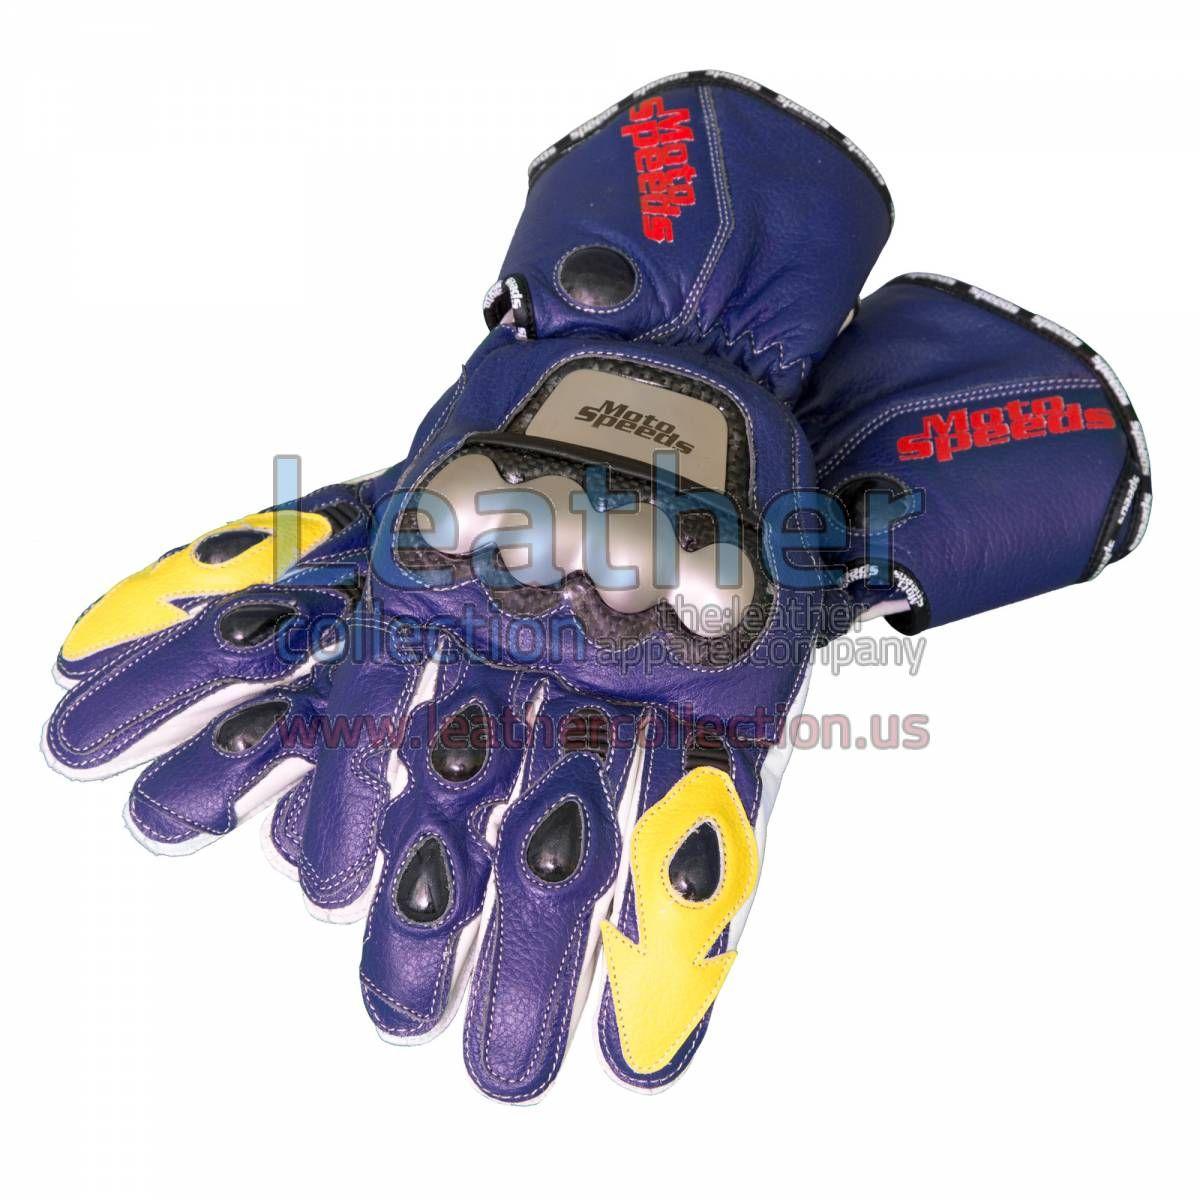 Chris Vermeulen Rizla Suzuki Race Gloves Https Www Leathercollection Us En We Chris Vermeulen Rizla Suzuki Race Gloves Html Motorcycle Gloves Suzuki Gloves